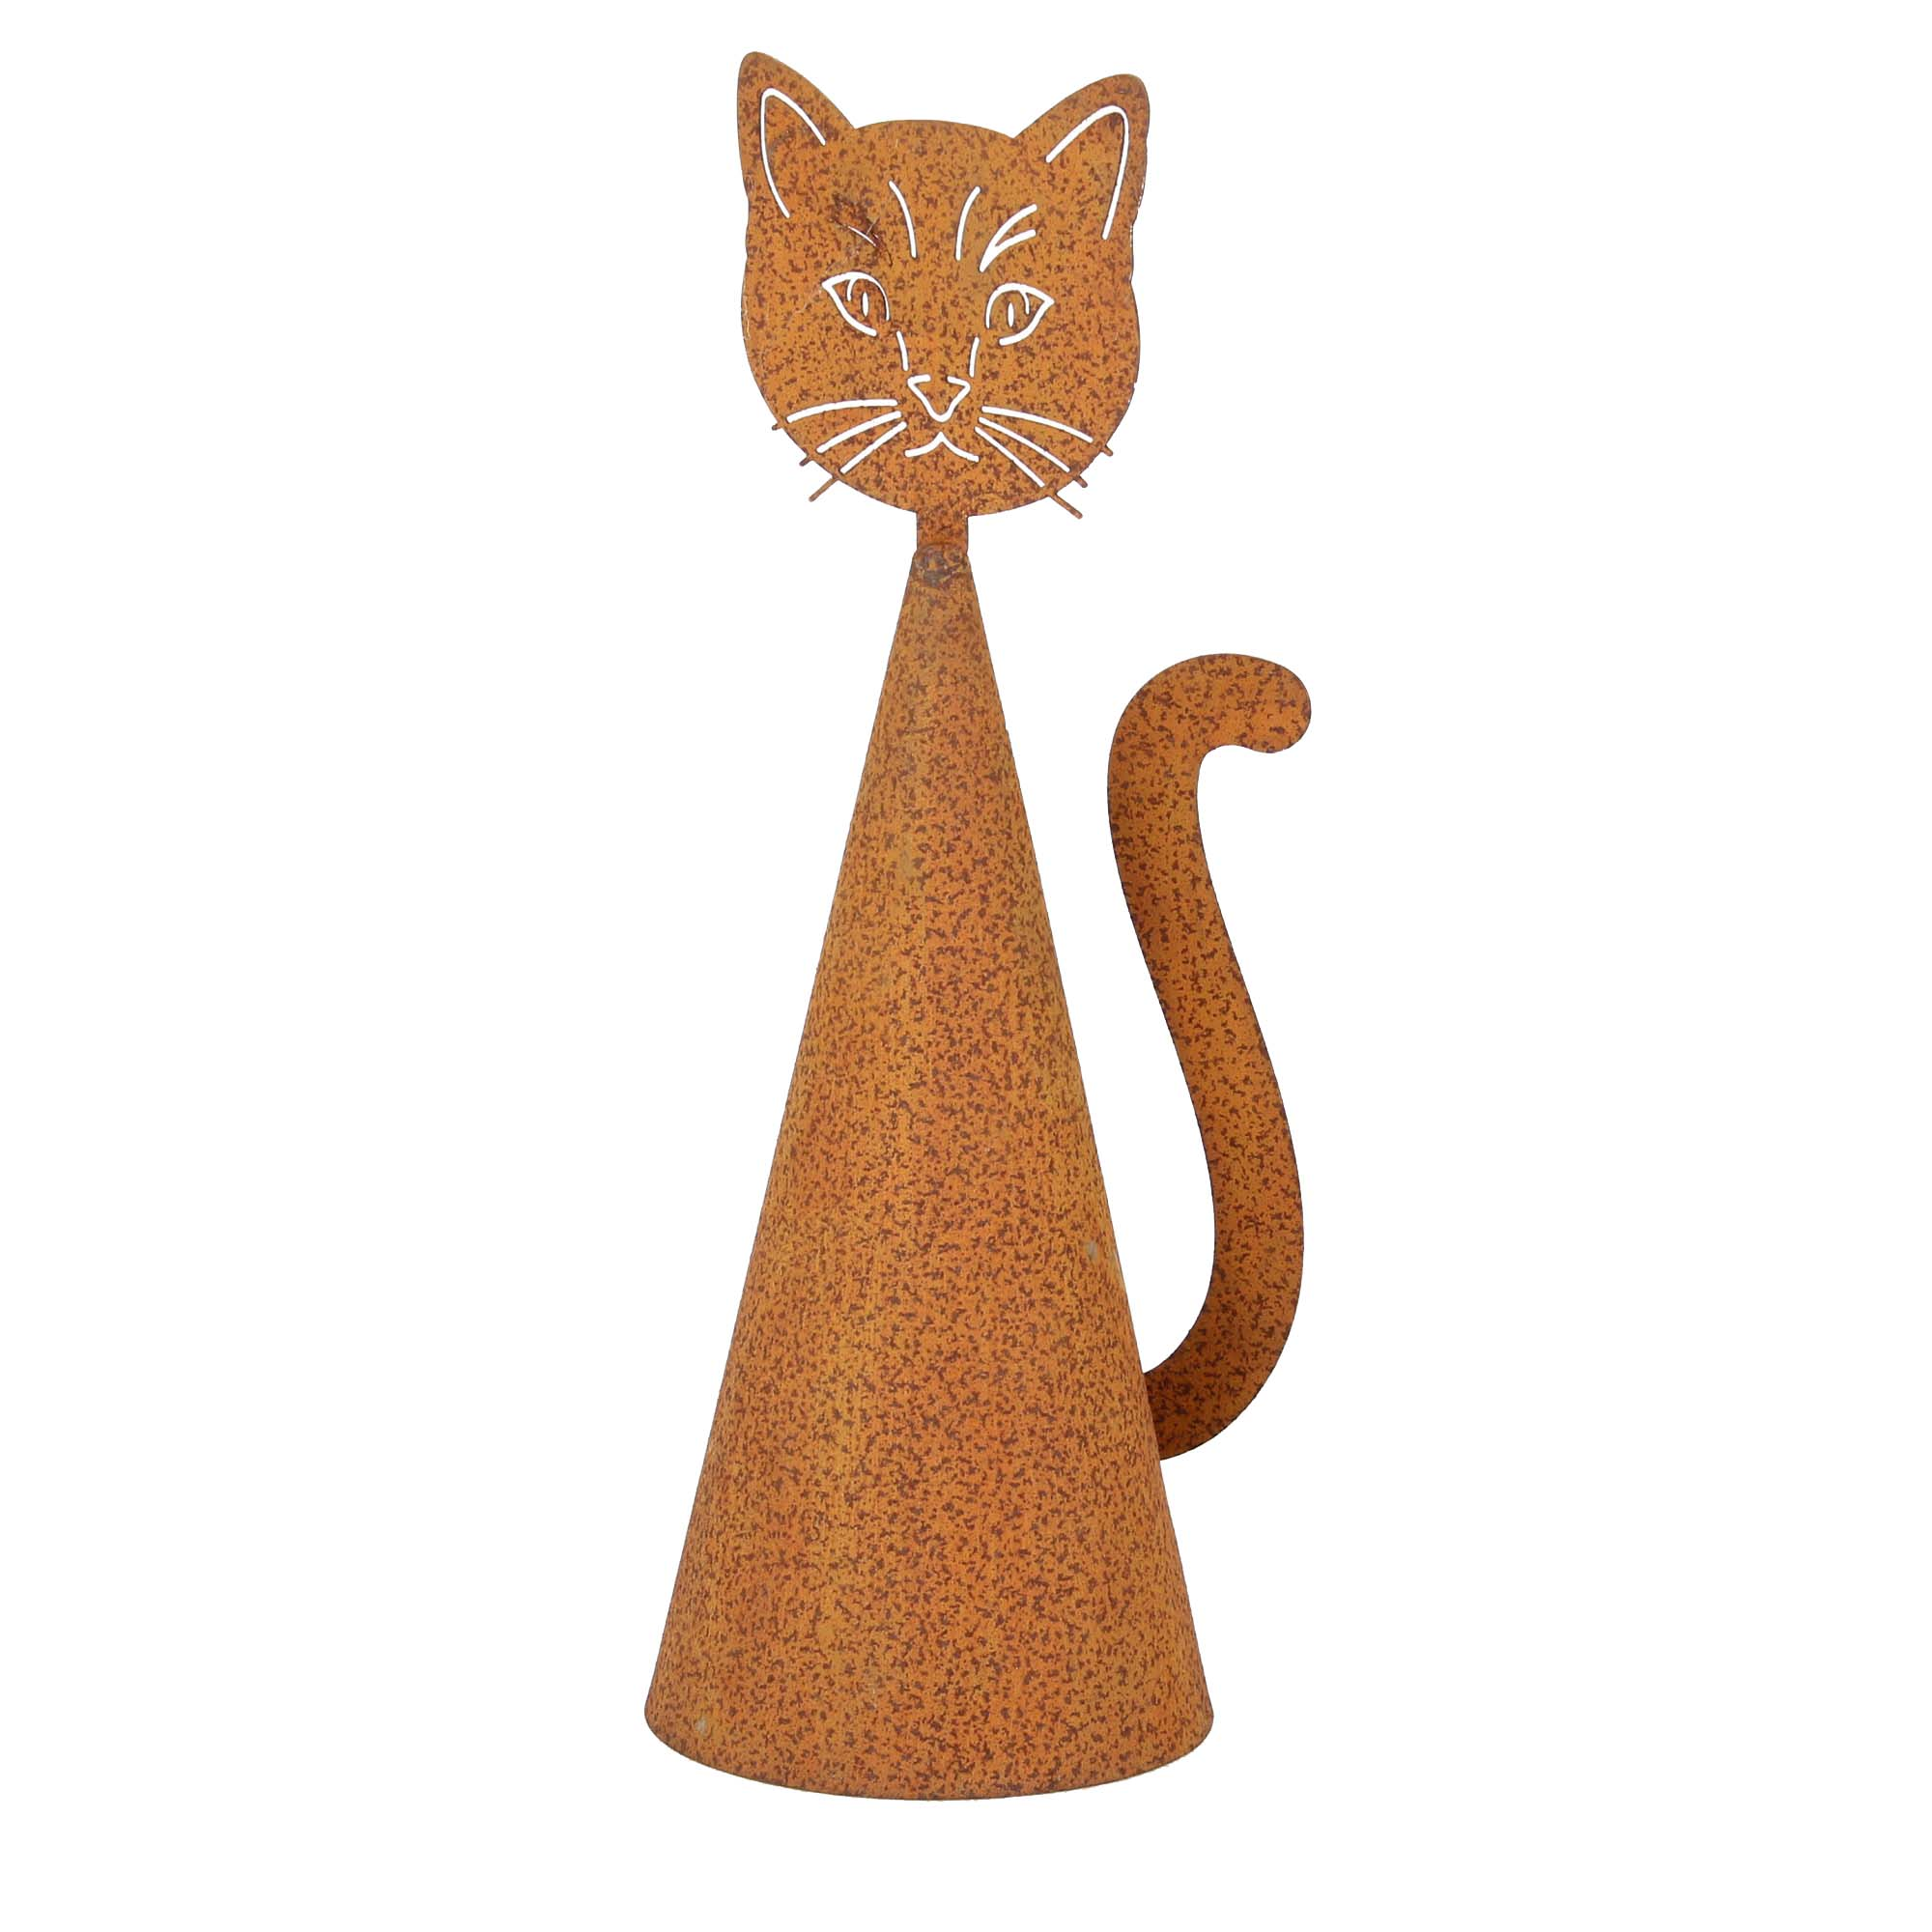 Dewoga 7395R Edelrost Zaunhocker Katze 2